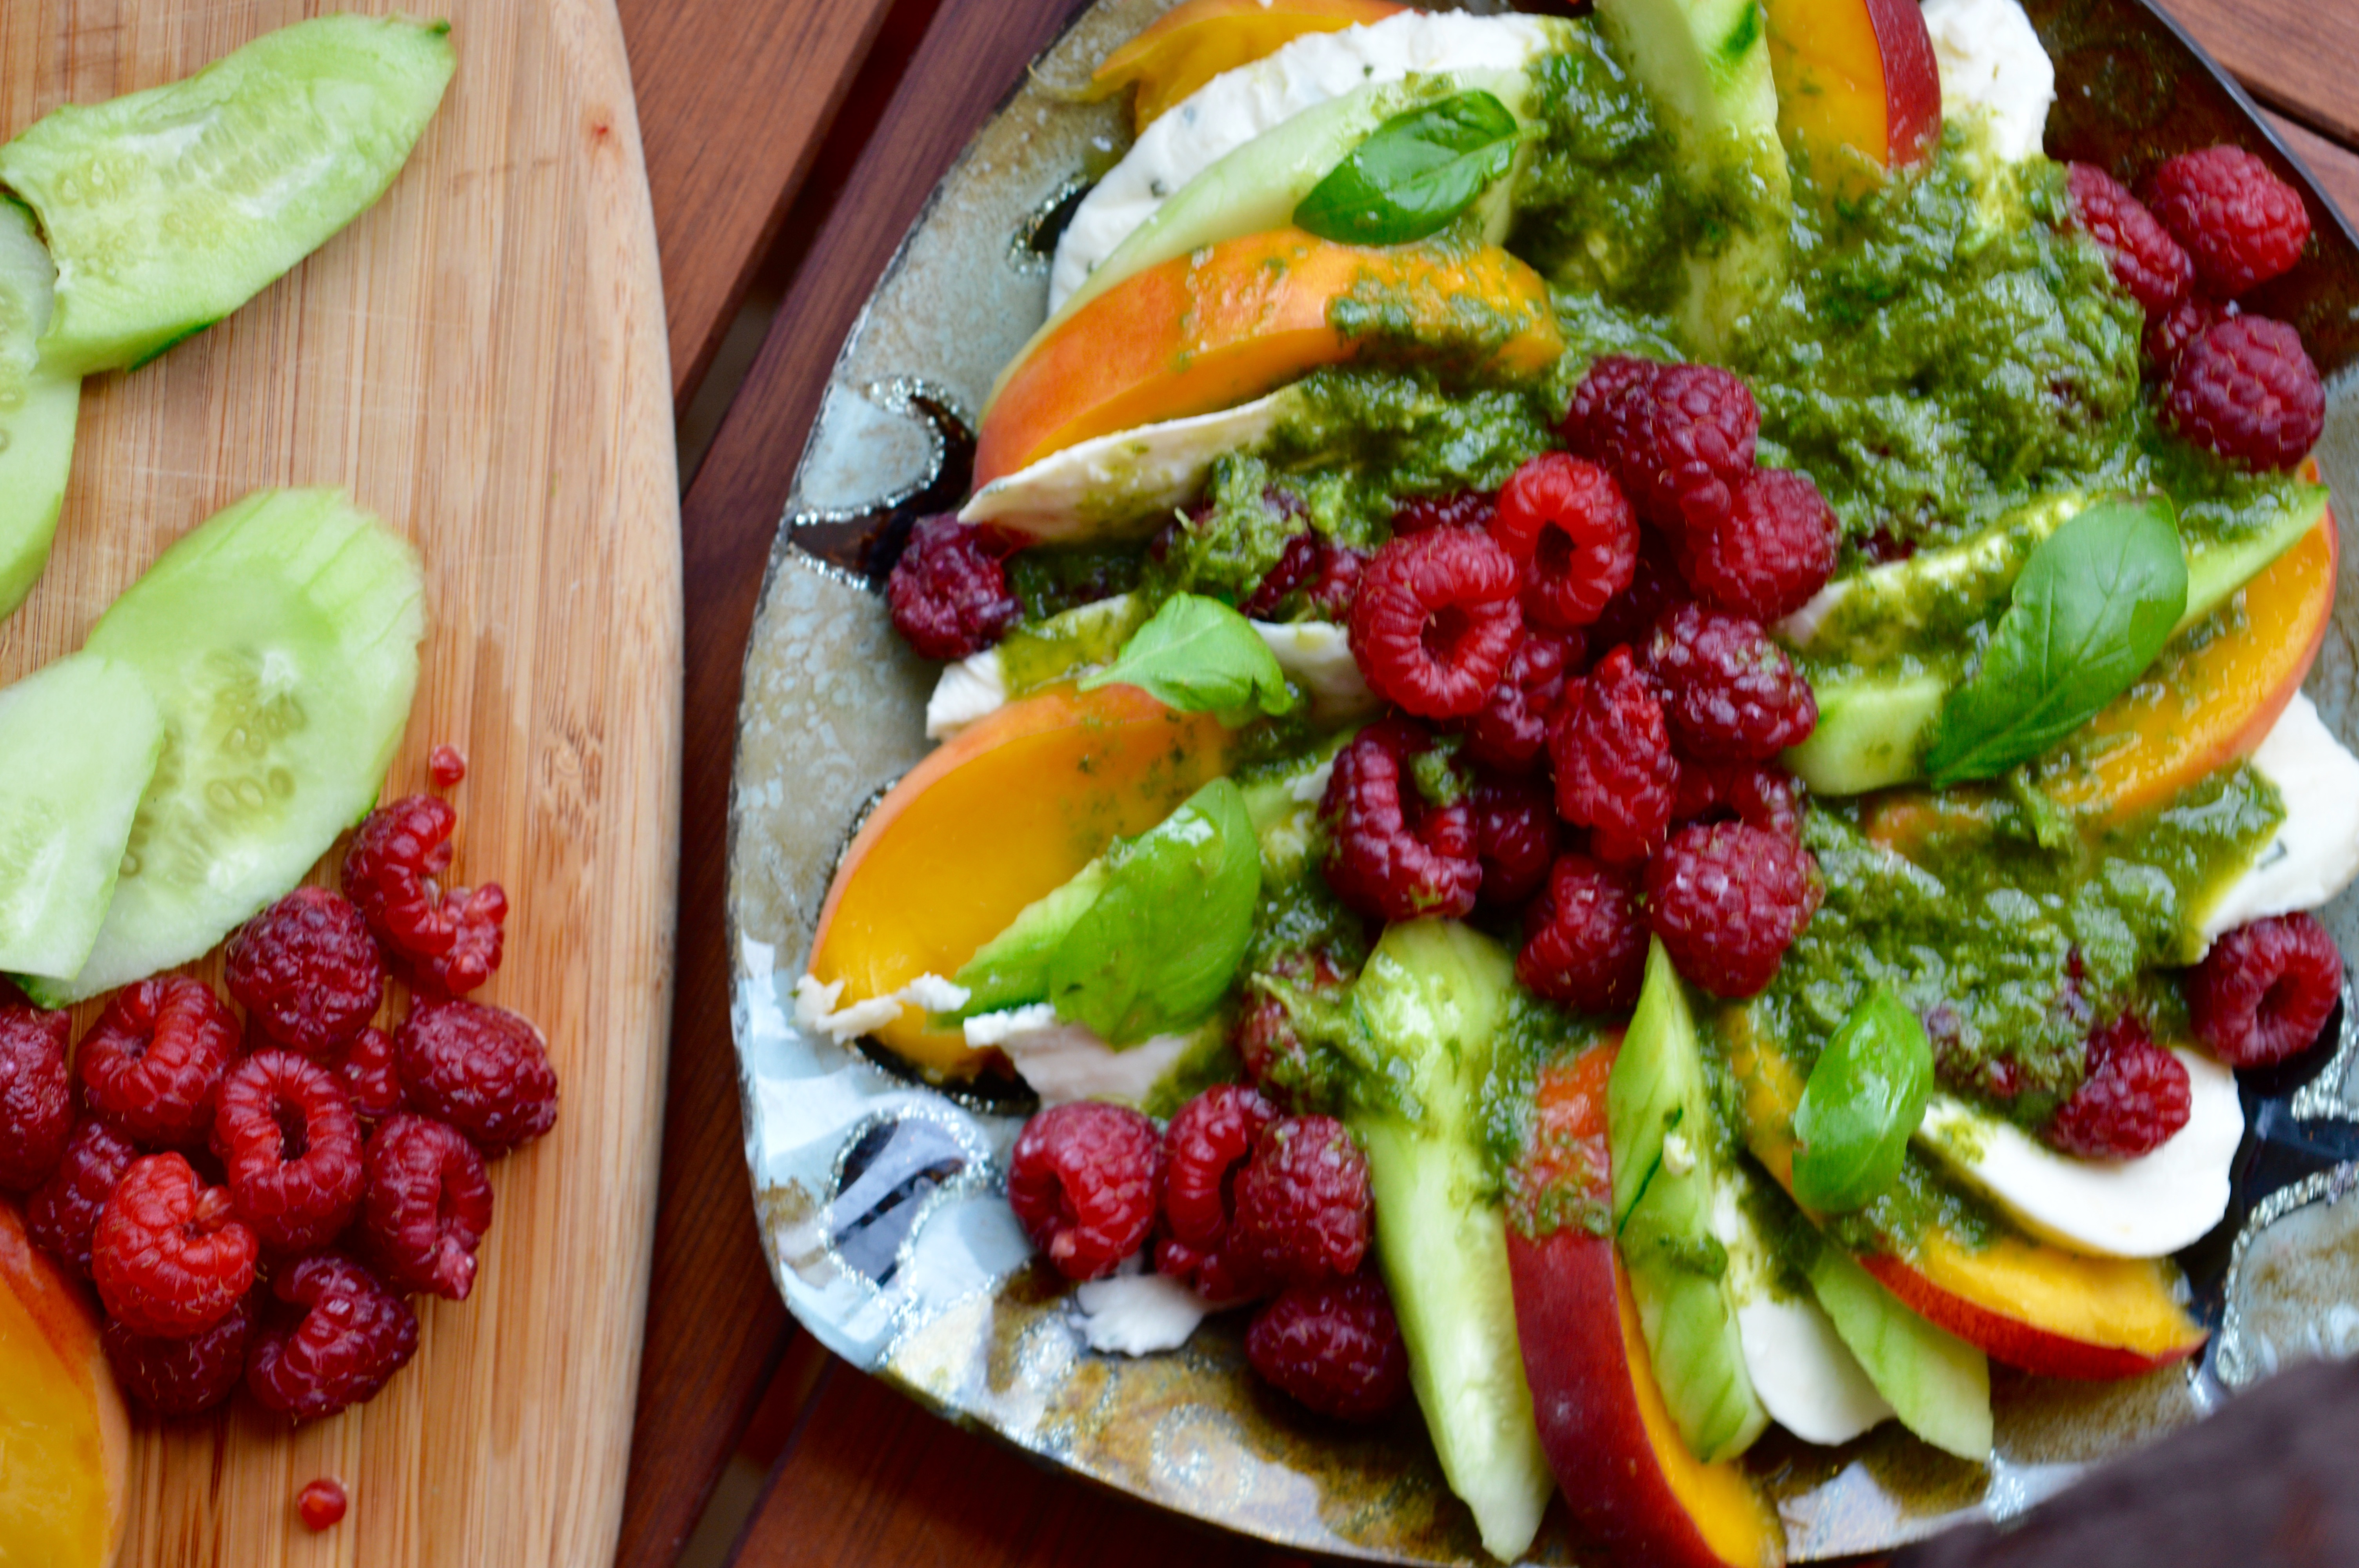 MM: Raspberry & Peach Salad